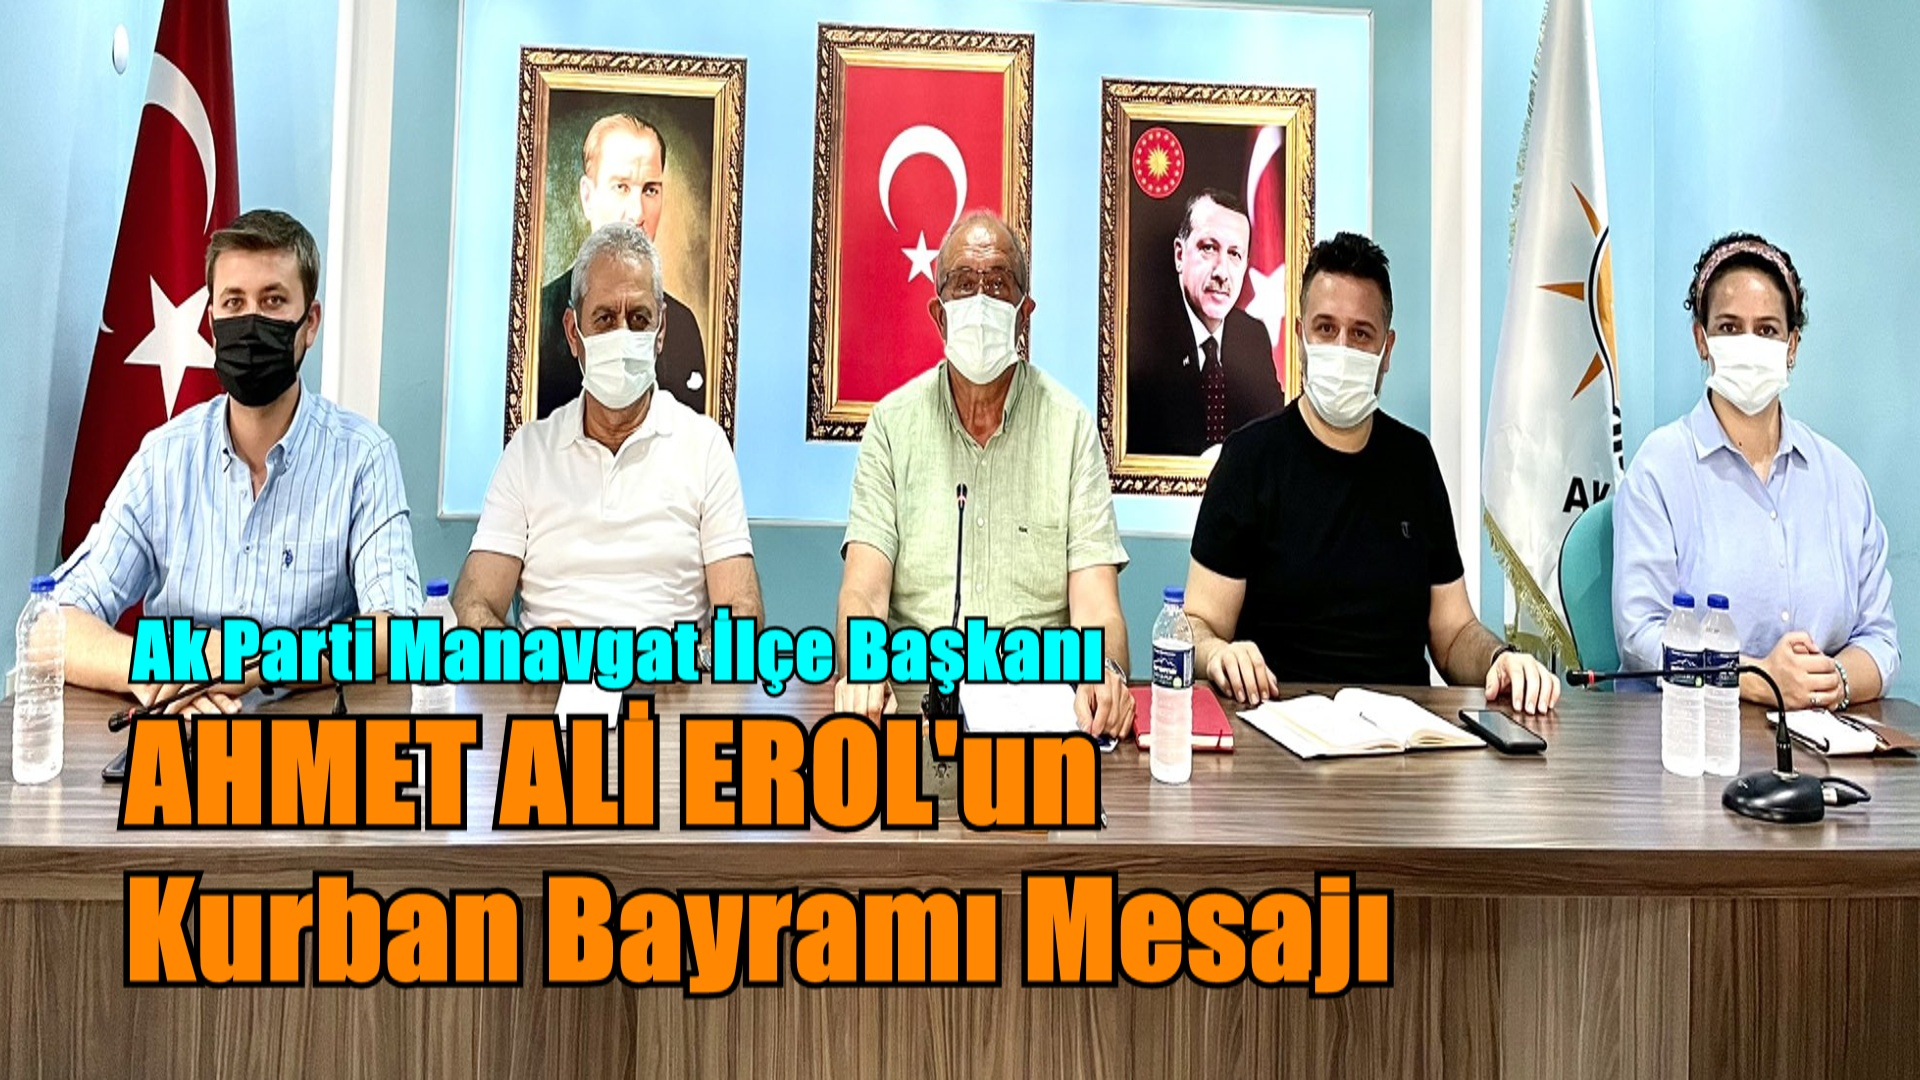 Başkan Erol'un Kurban Bayramı mesajı